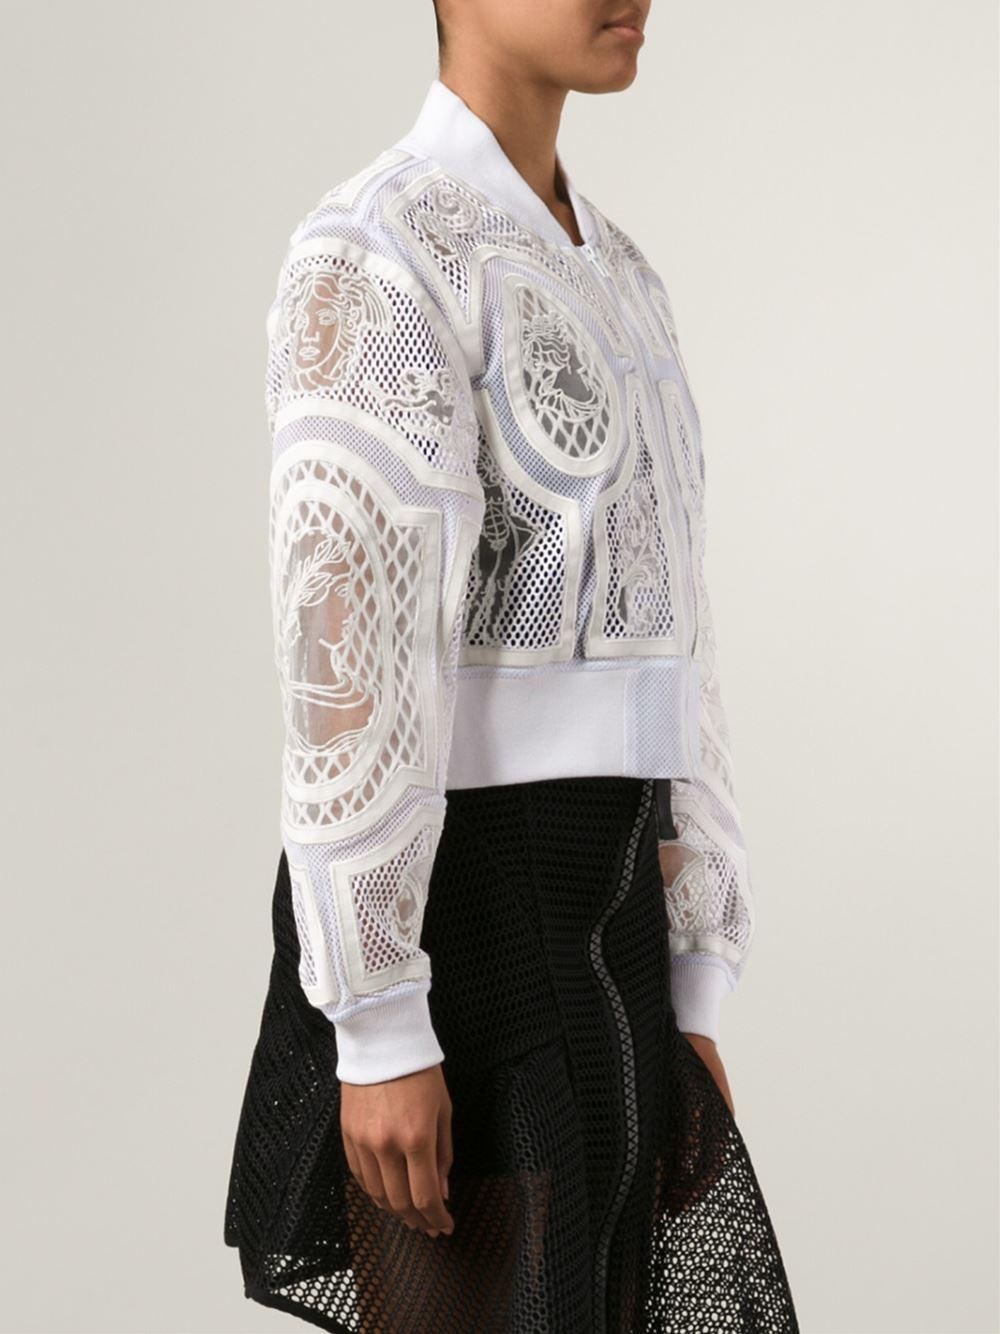 Ktz Embroidered Mesh Bomber Jacket In White Lyst